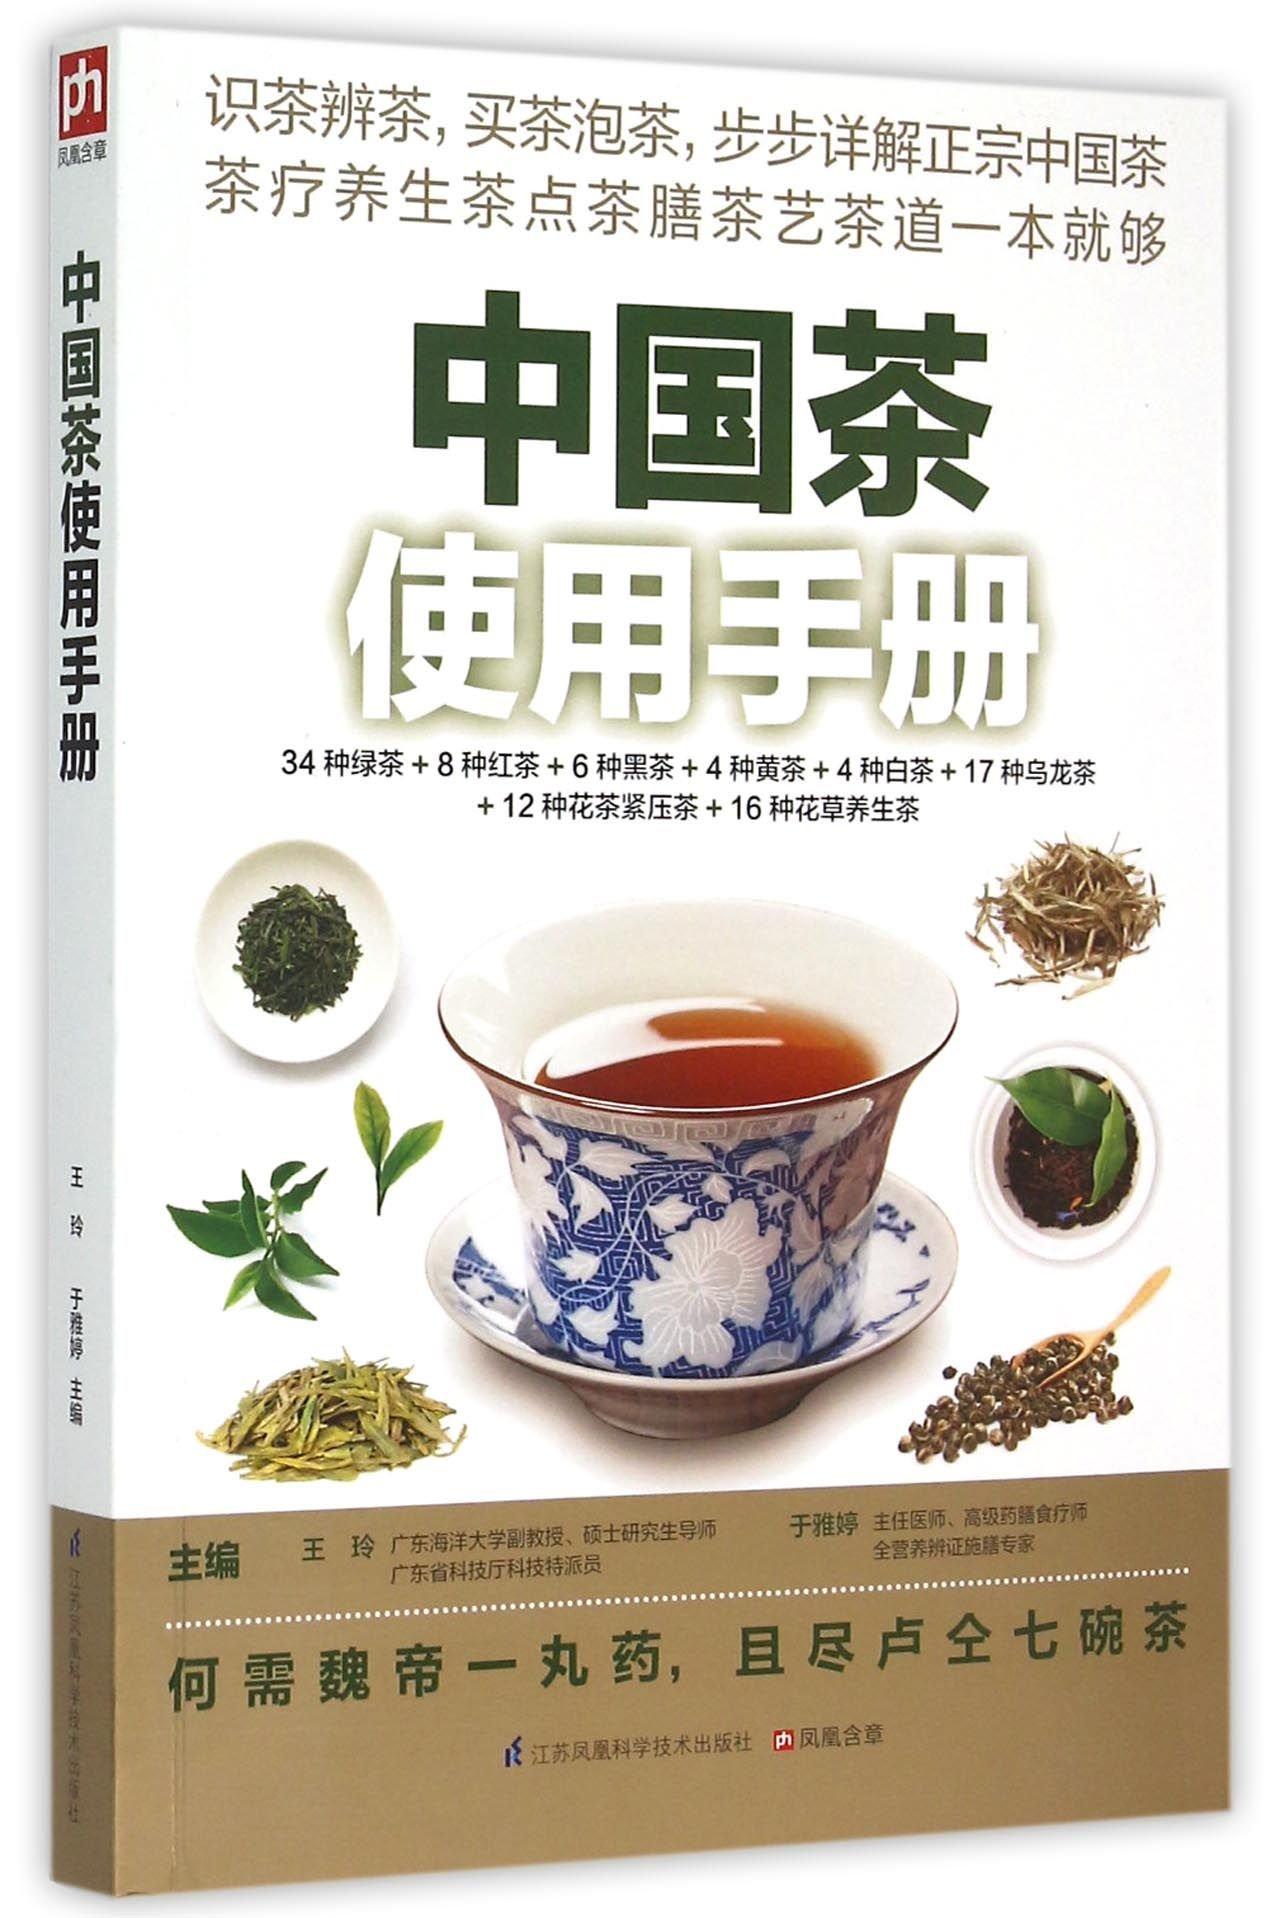 Chinese Tea Manual (Chinese Edition) PDF